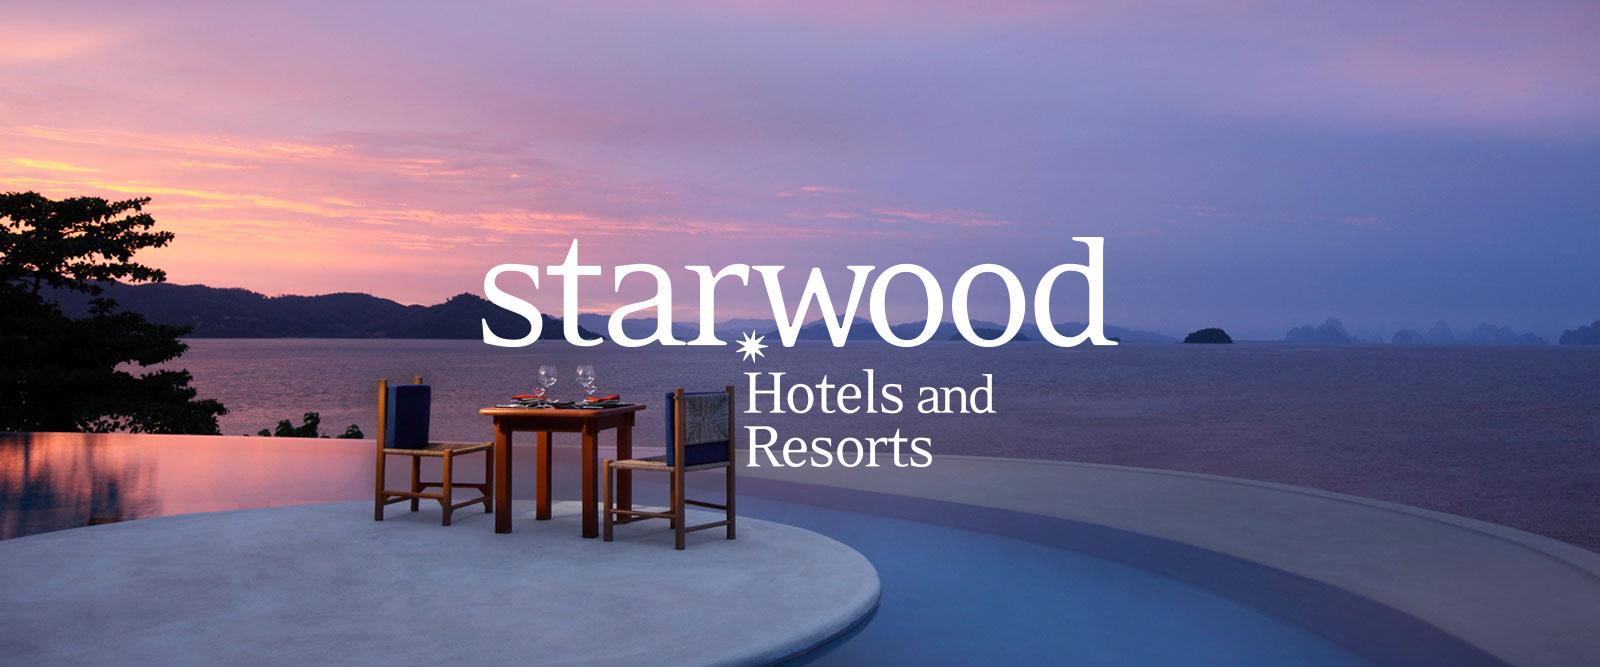 Starwood Hotels & Resorts Logos - Spg Hotels California Map